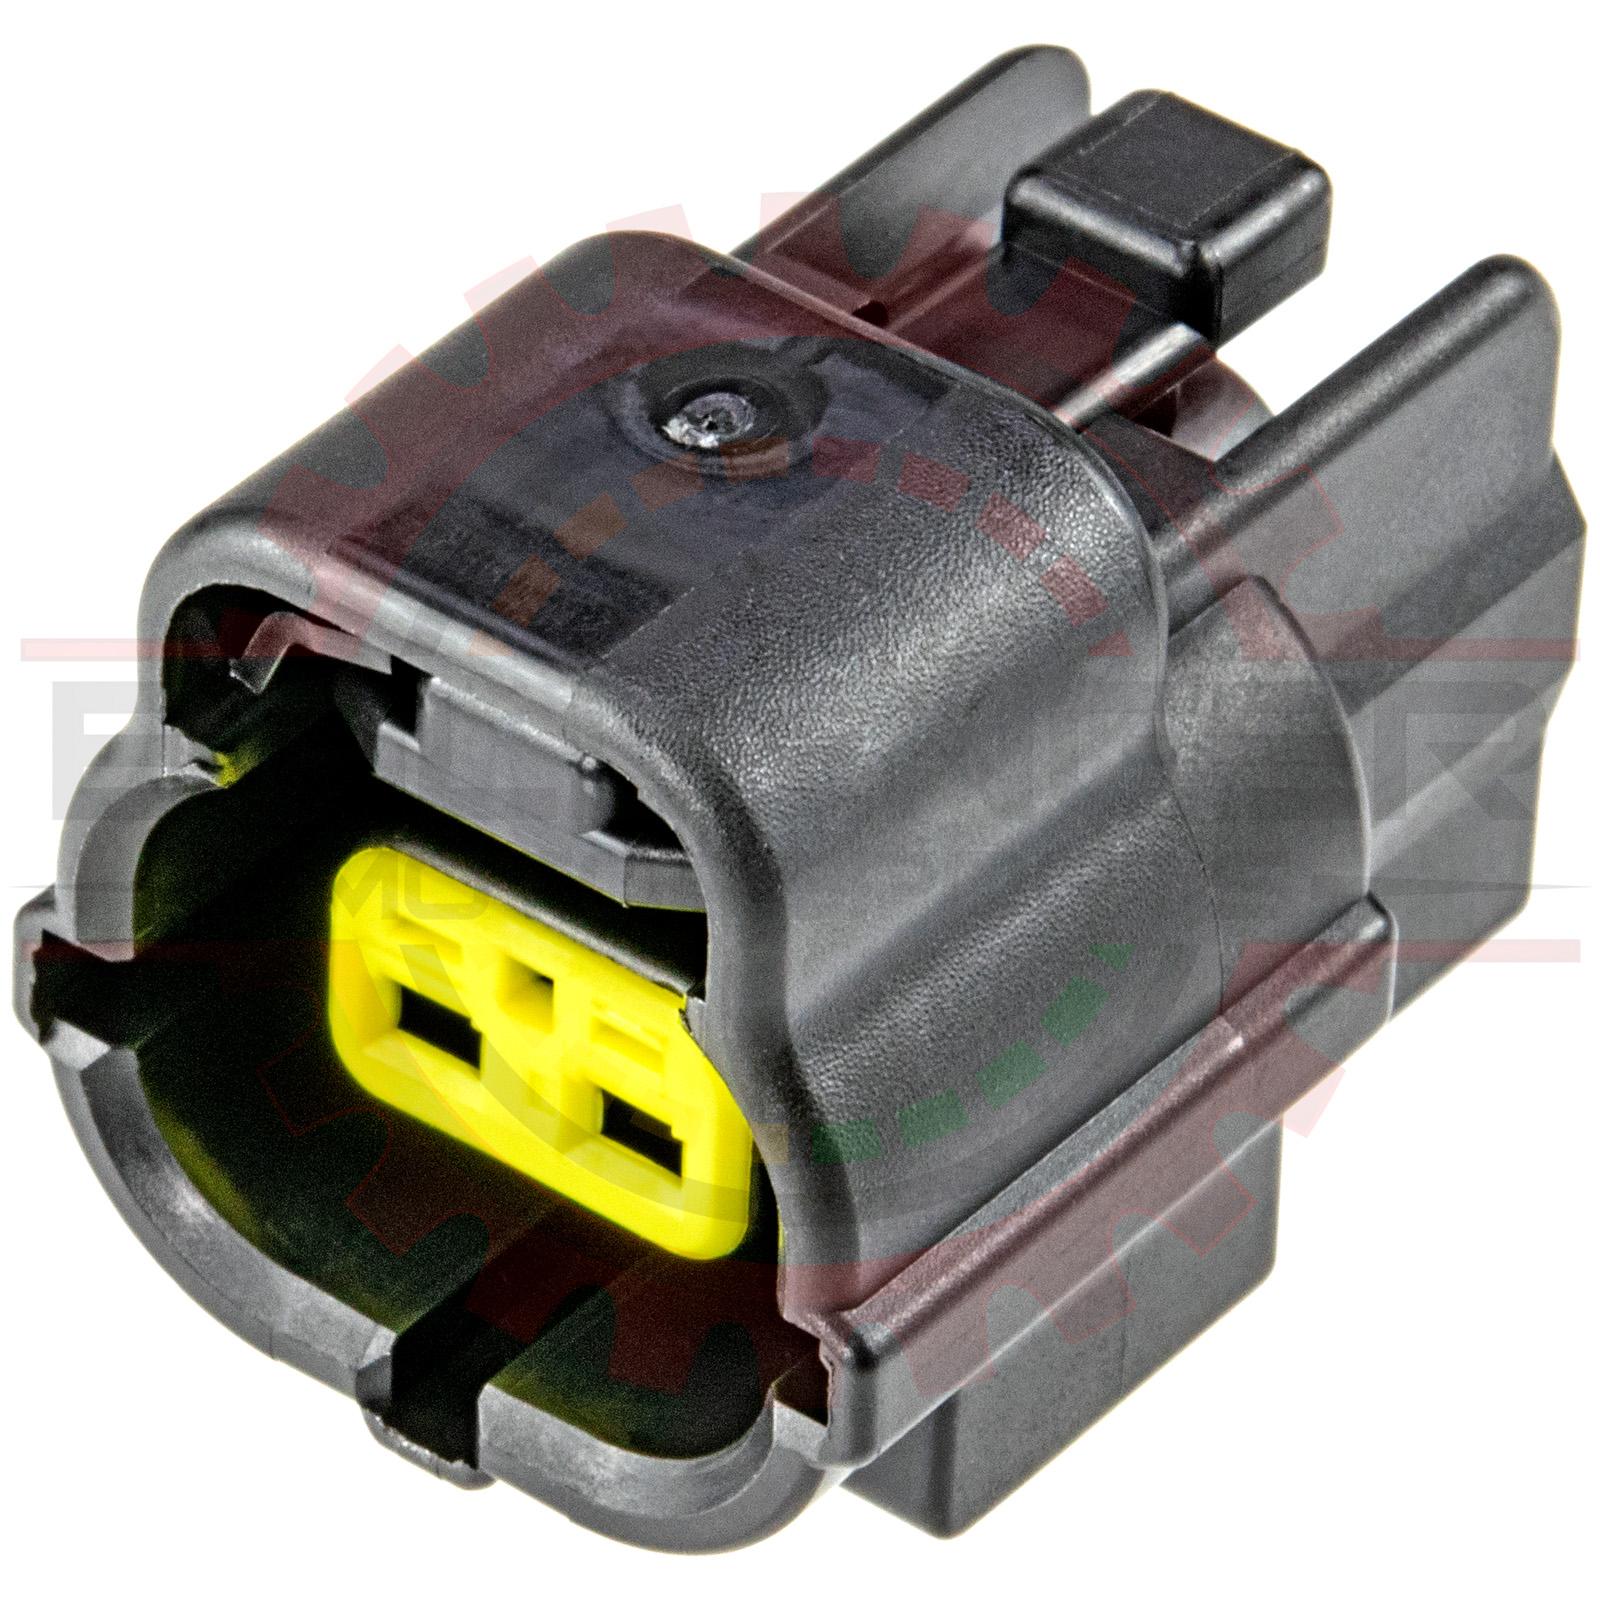 Home  U00bb Shop  U00bb Connectors    Harnesses  U00bb Tyco    Amp  U00bb 2